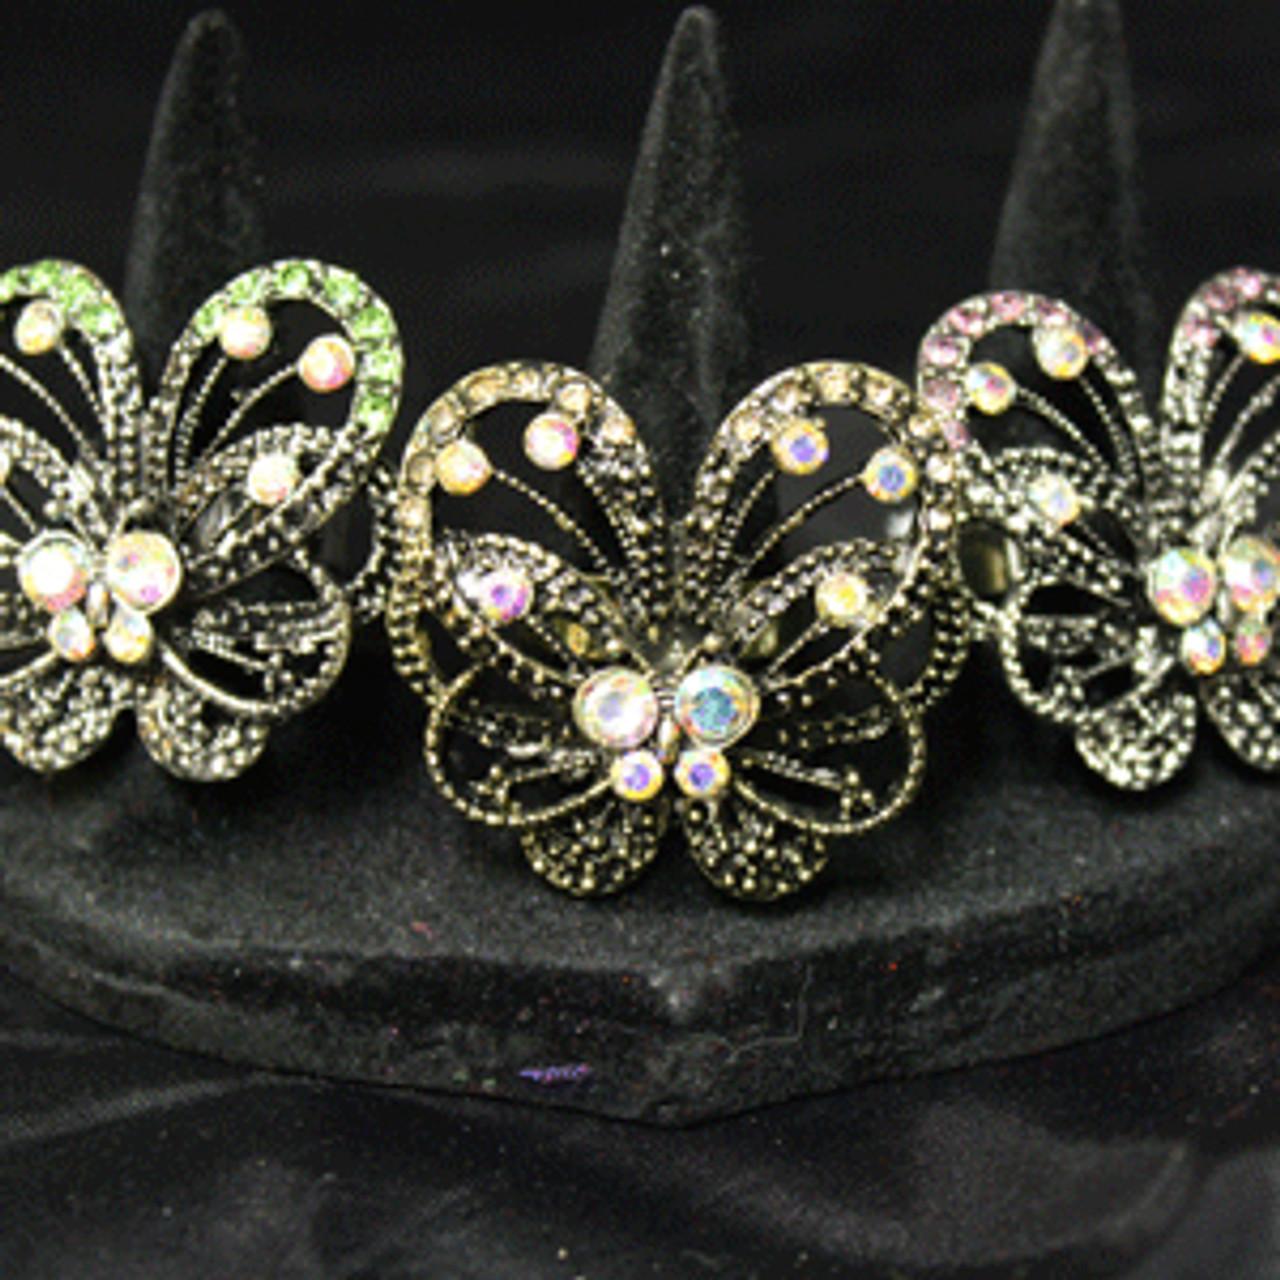 Cheap butterfly rings